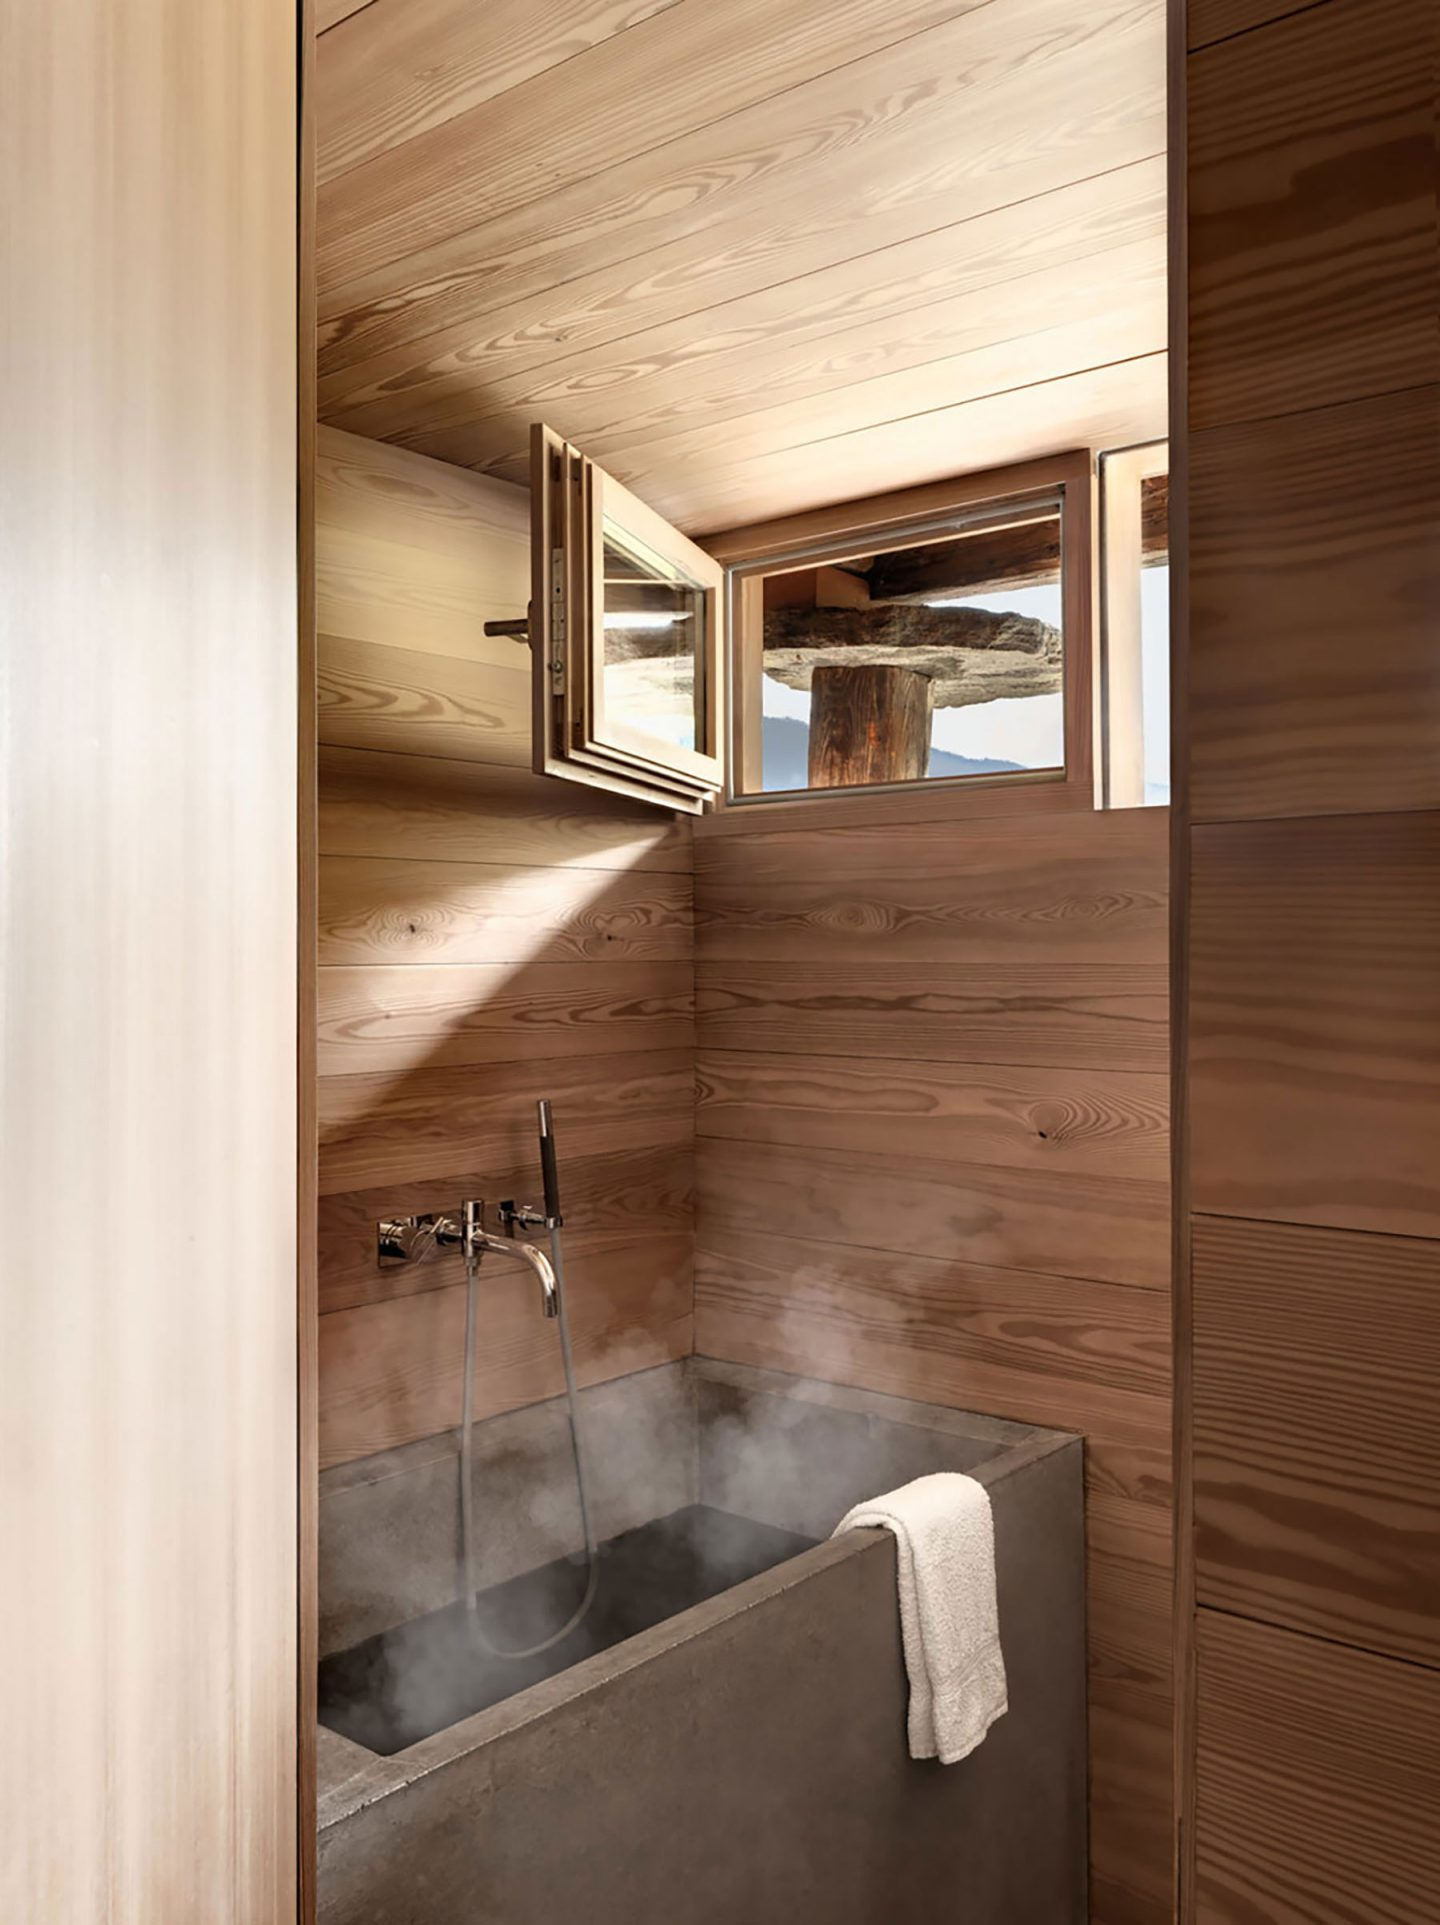 iGNANT-Architecture-Rapin-Saiz-Sarreyer-Cabin-27